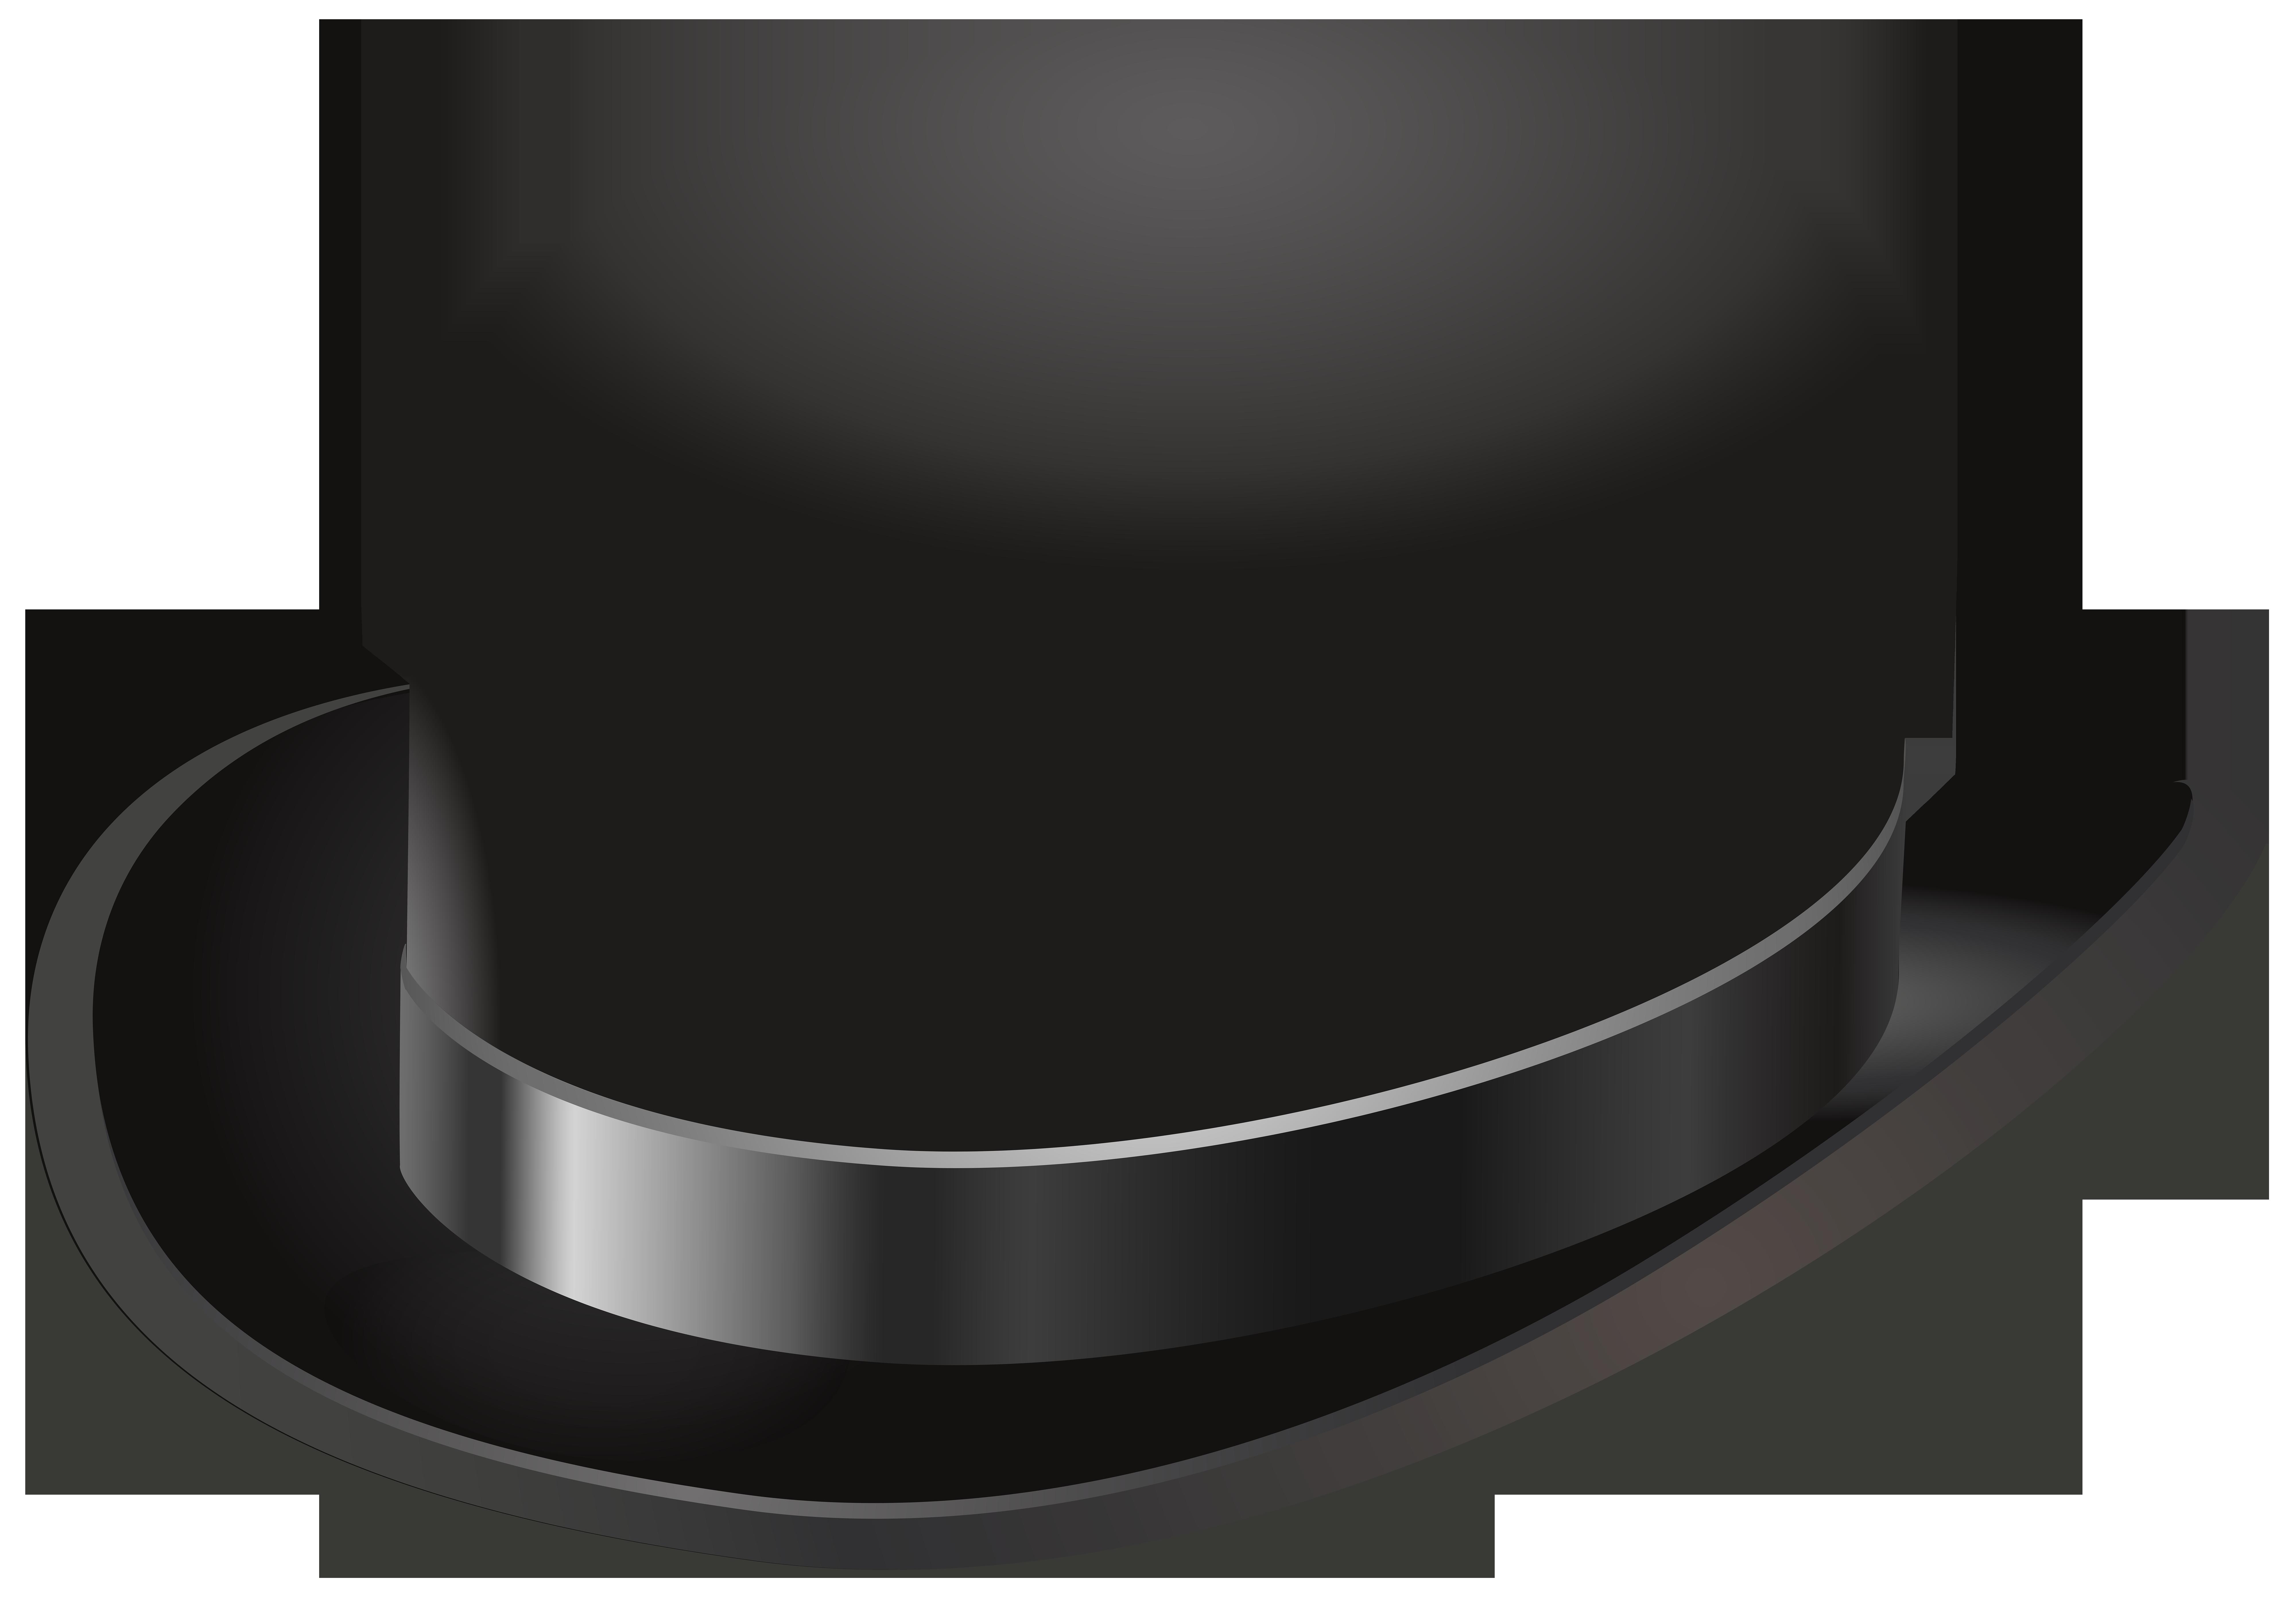 Vintage Hat Transparent PNG Clip Art Image.